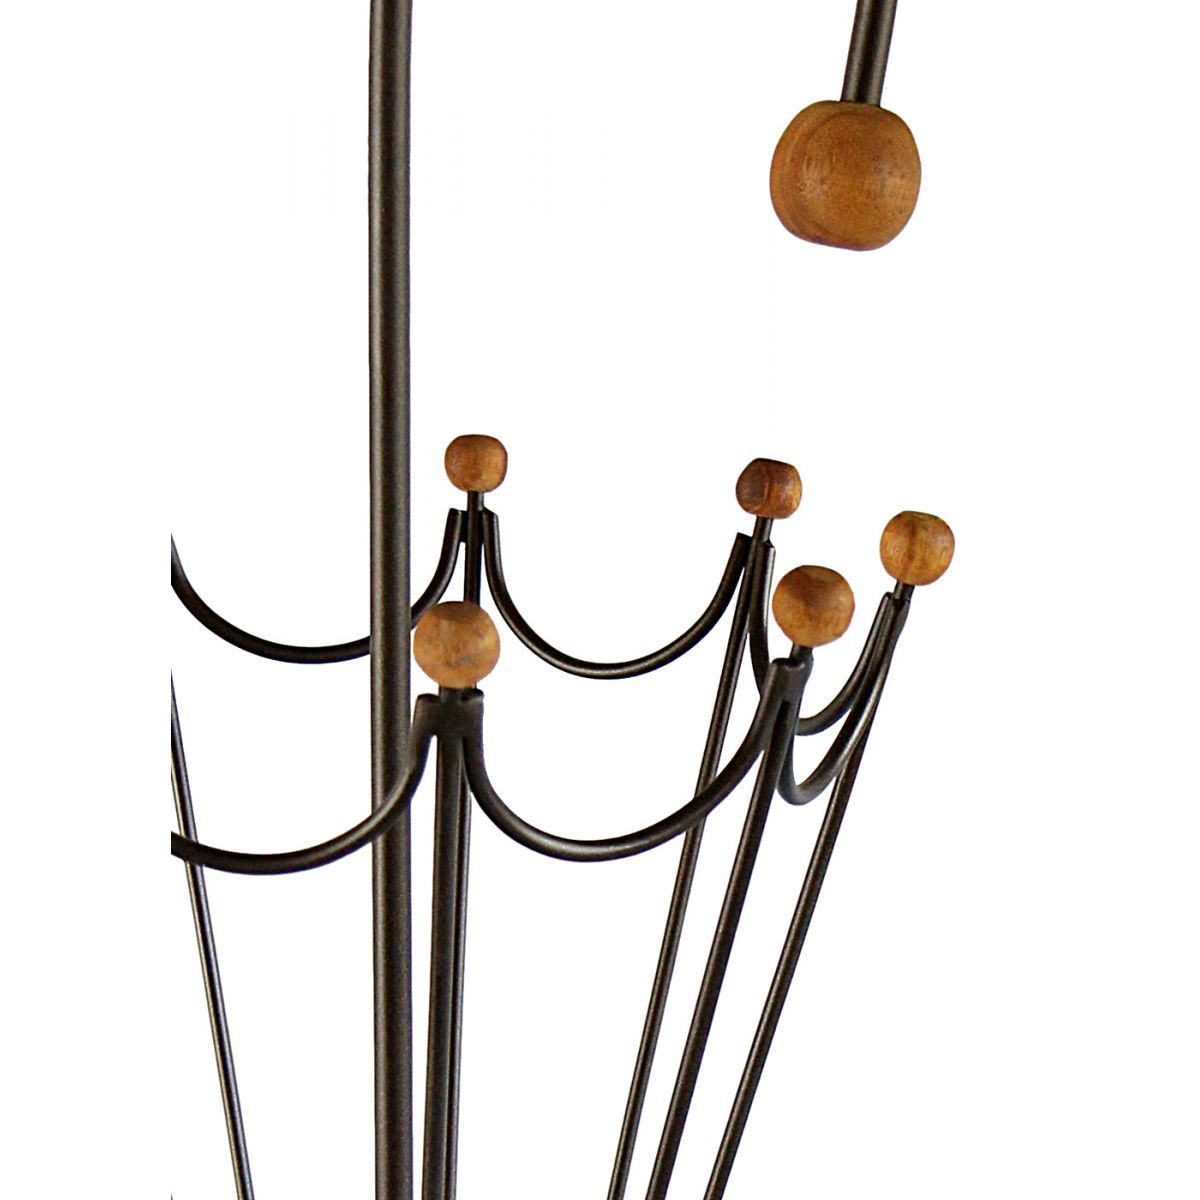 Suporte para Porta Guarda-Chuvas Artesanal de Metal Decorativo Sala